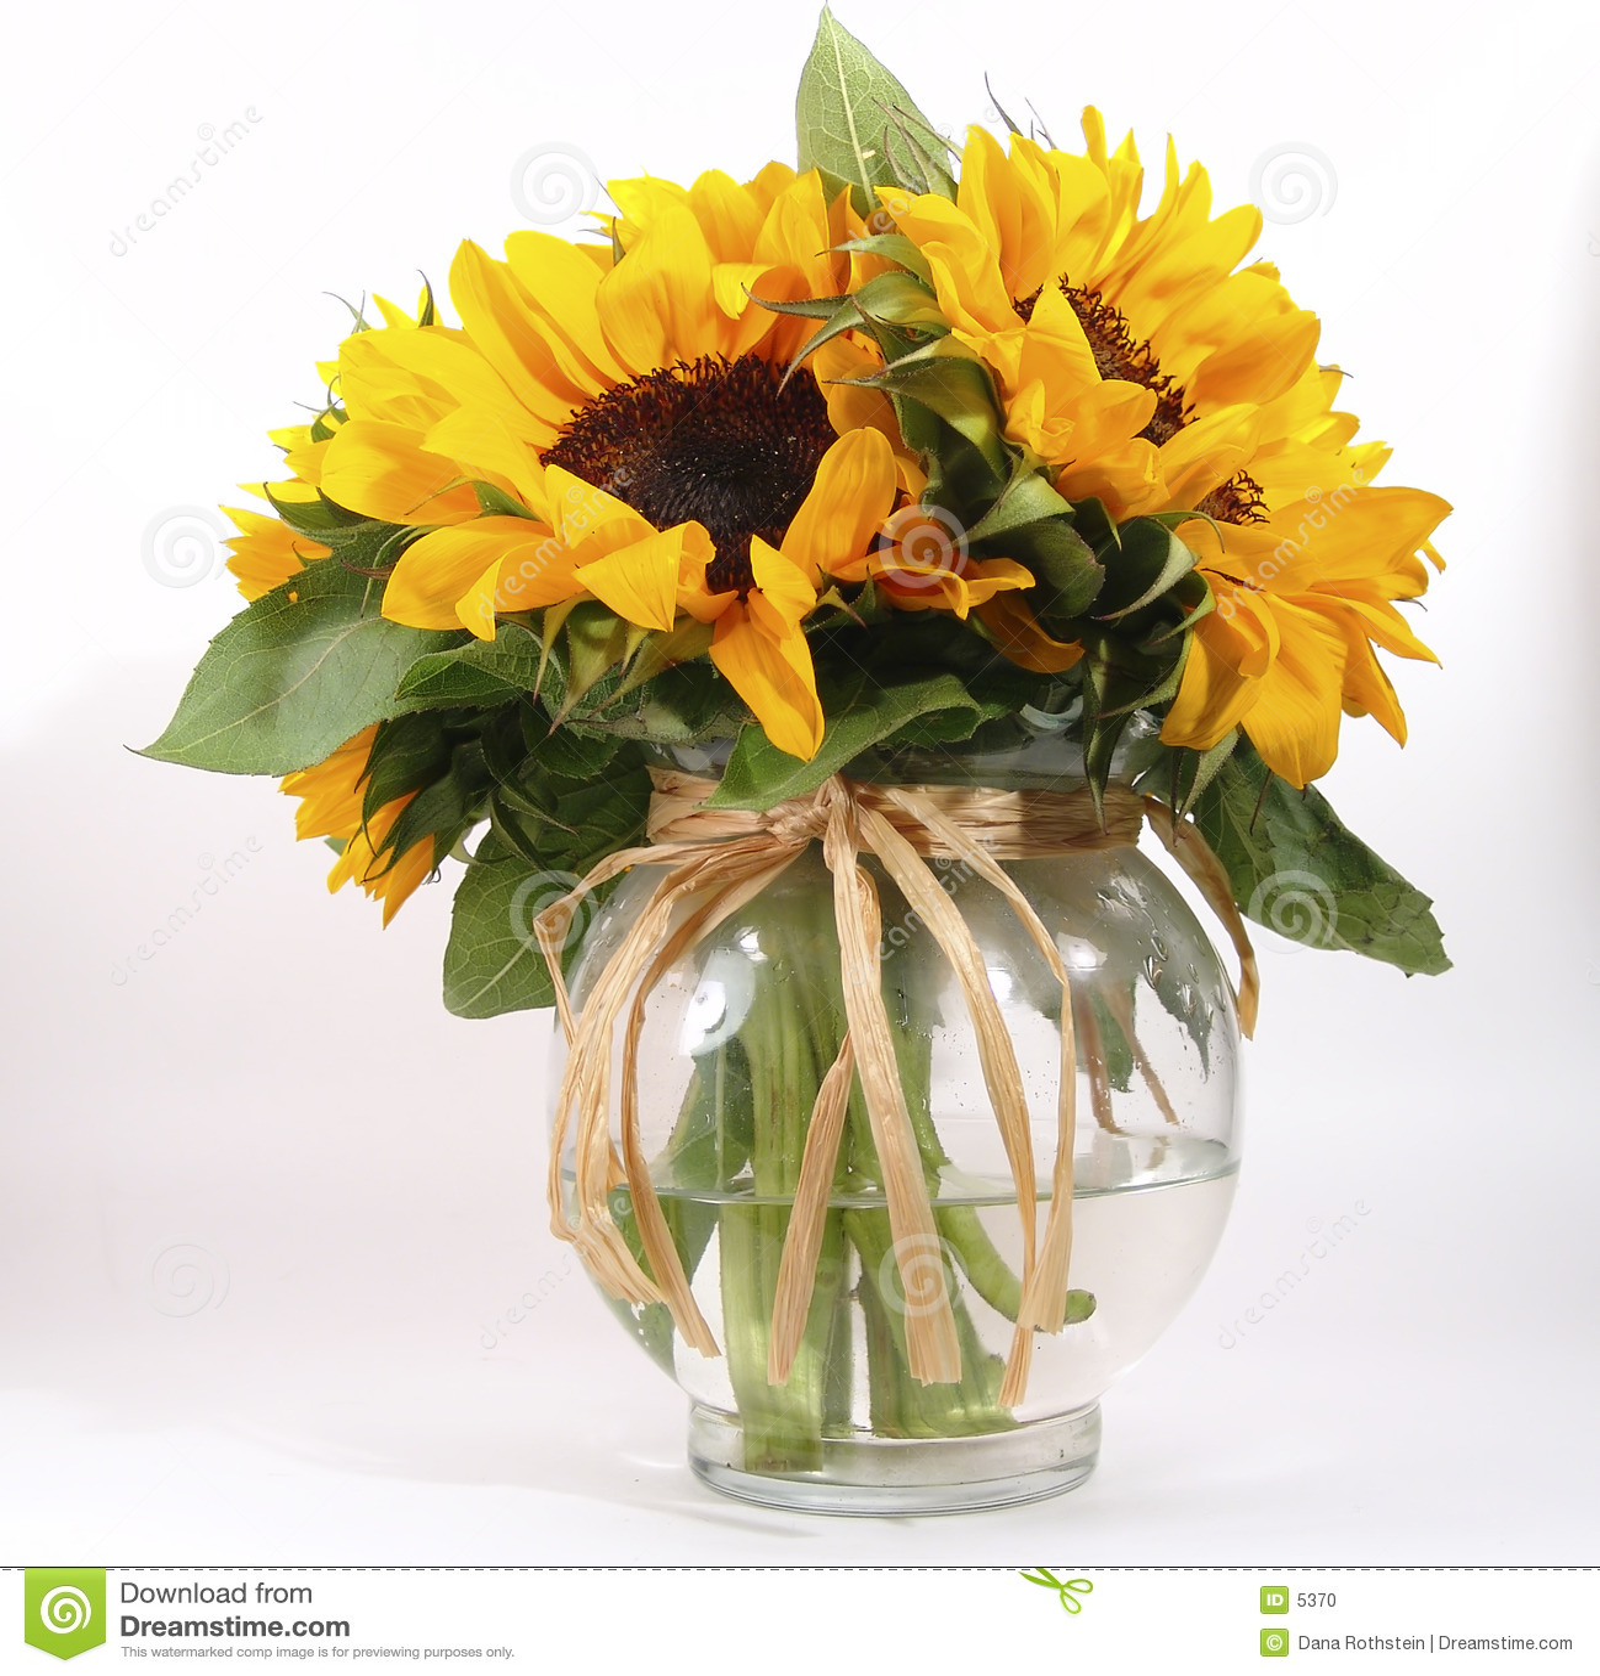 Sunflowers In Vase Stock Photo Image 5370